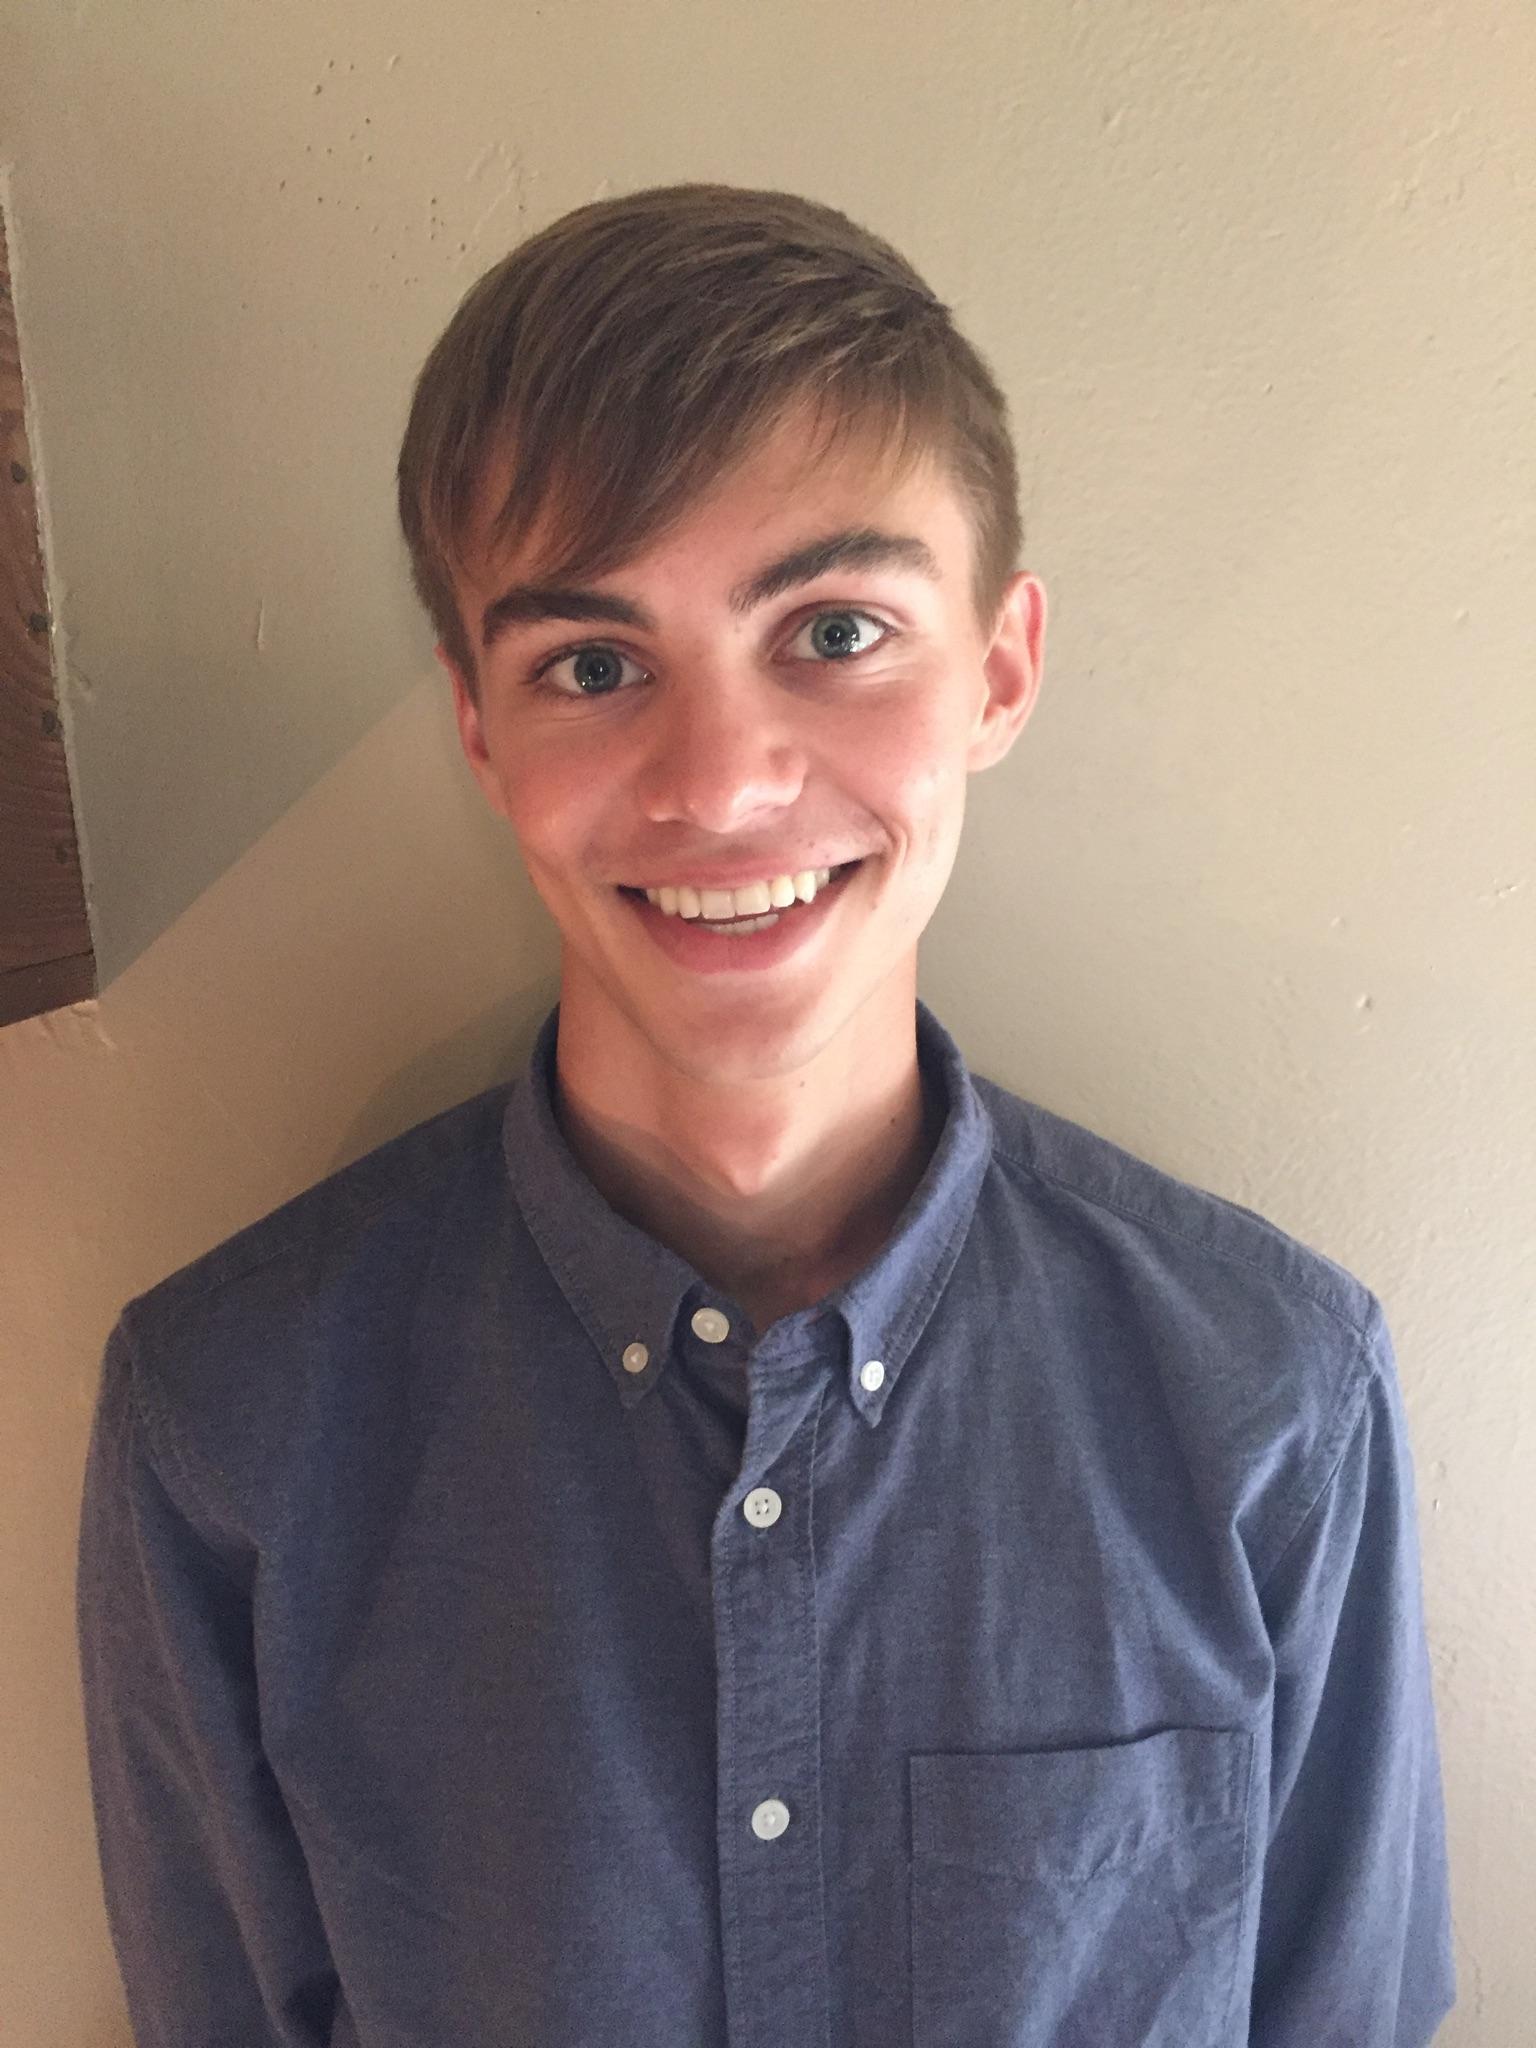 Matthew burghart , CIRCLE CHURCH STUDENT PASTOR